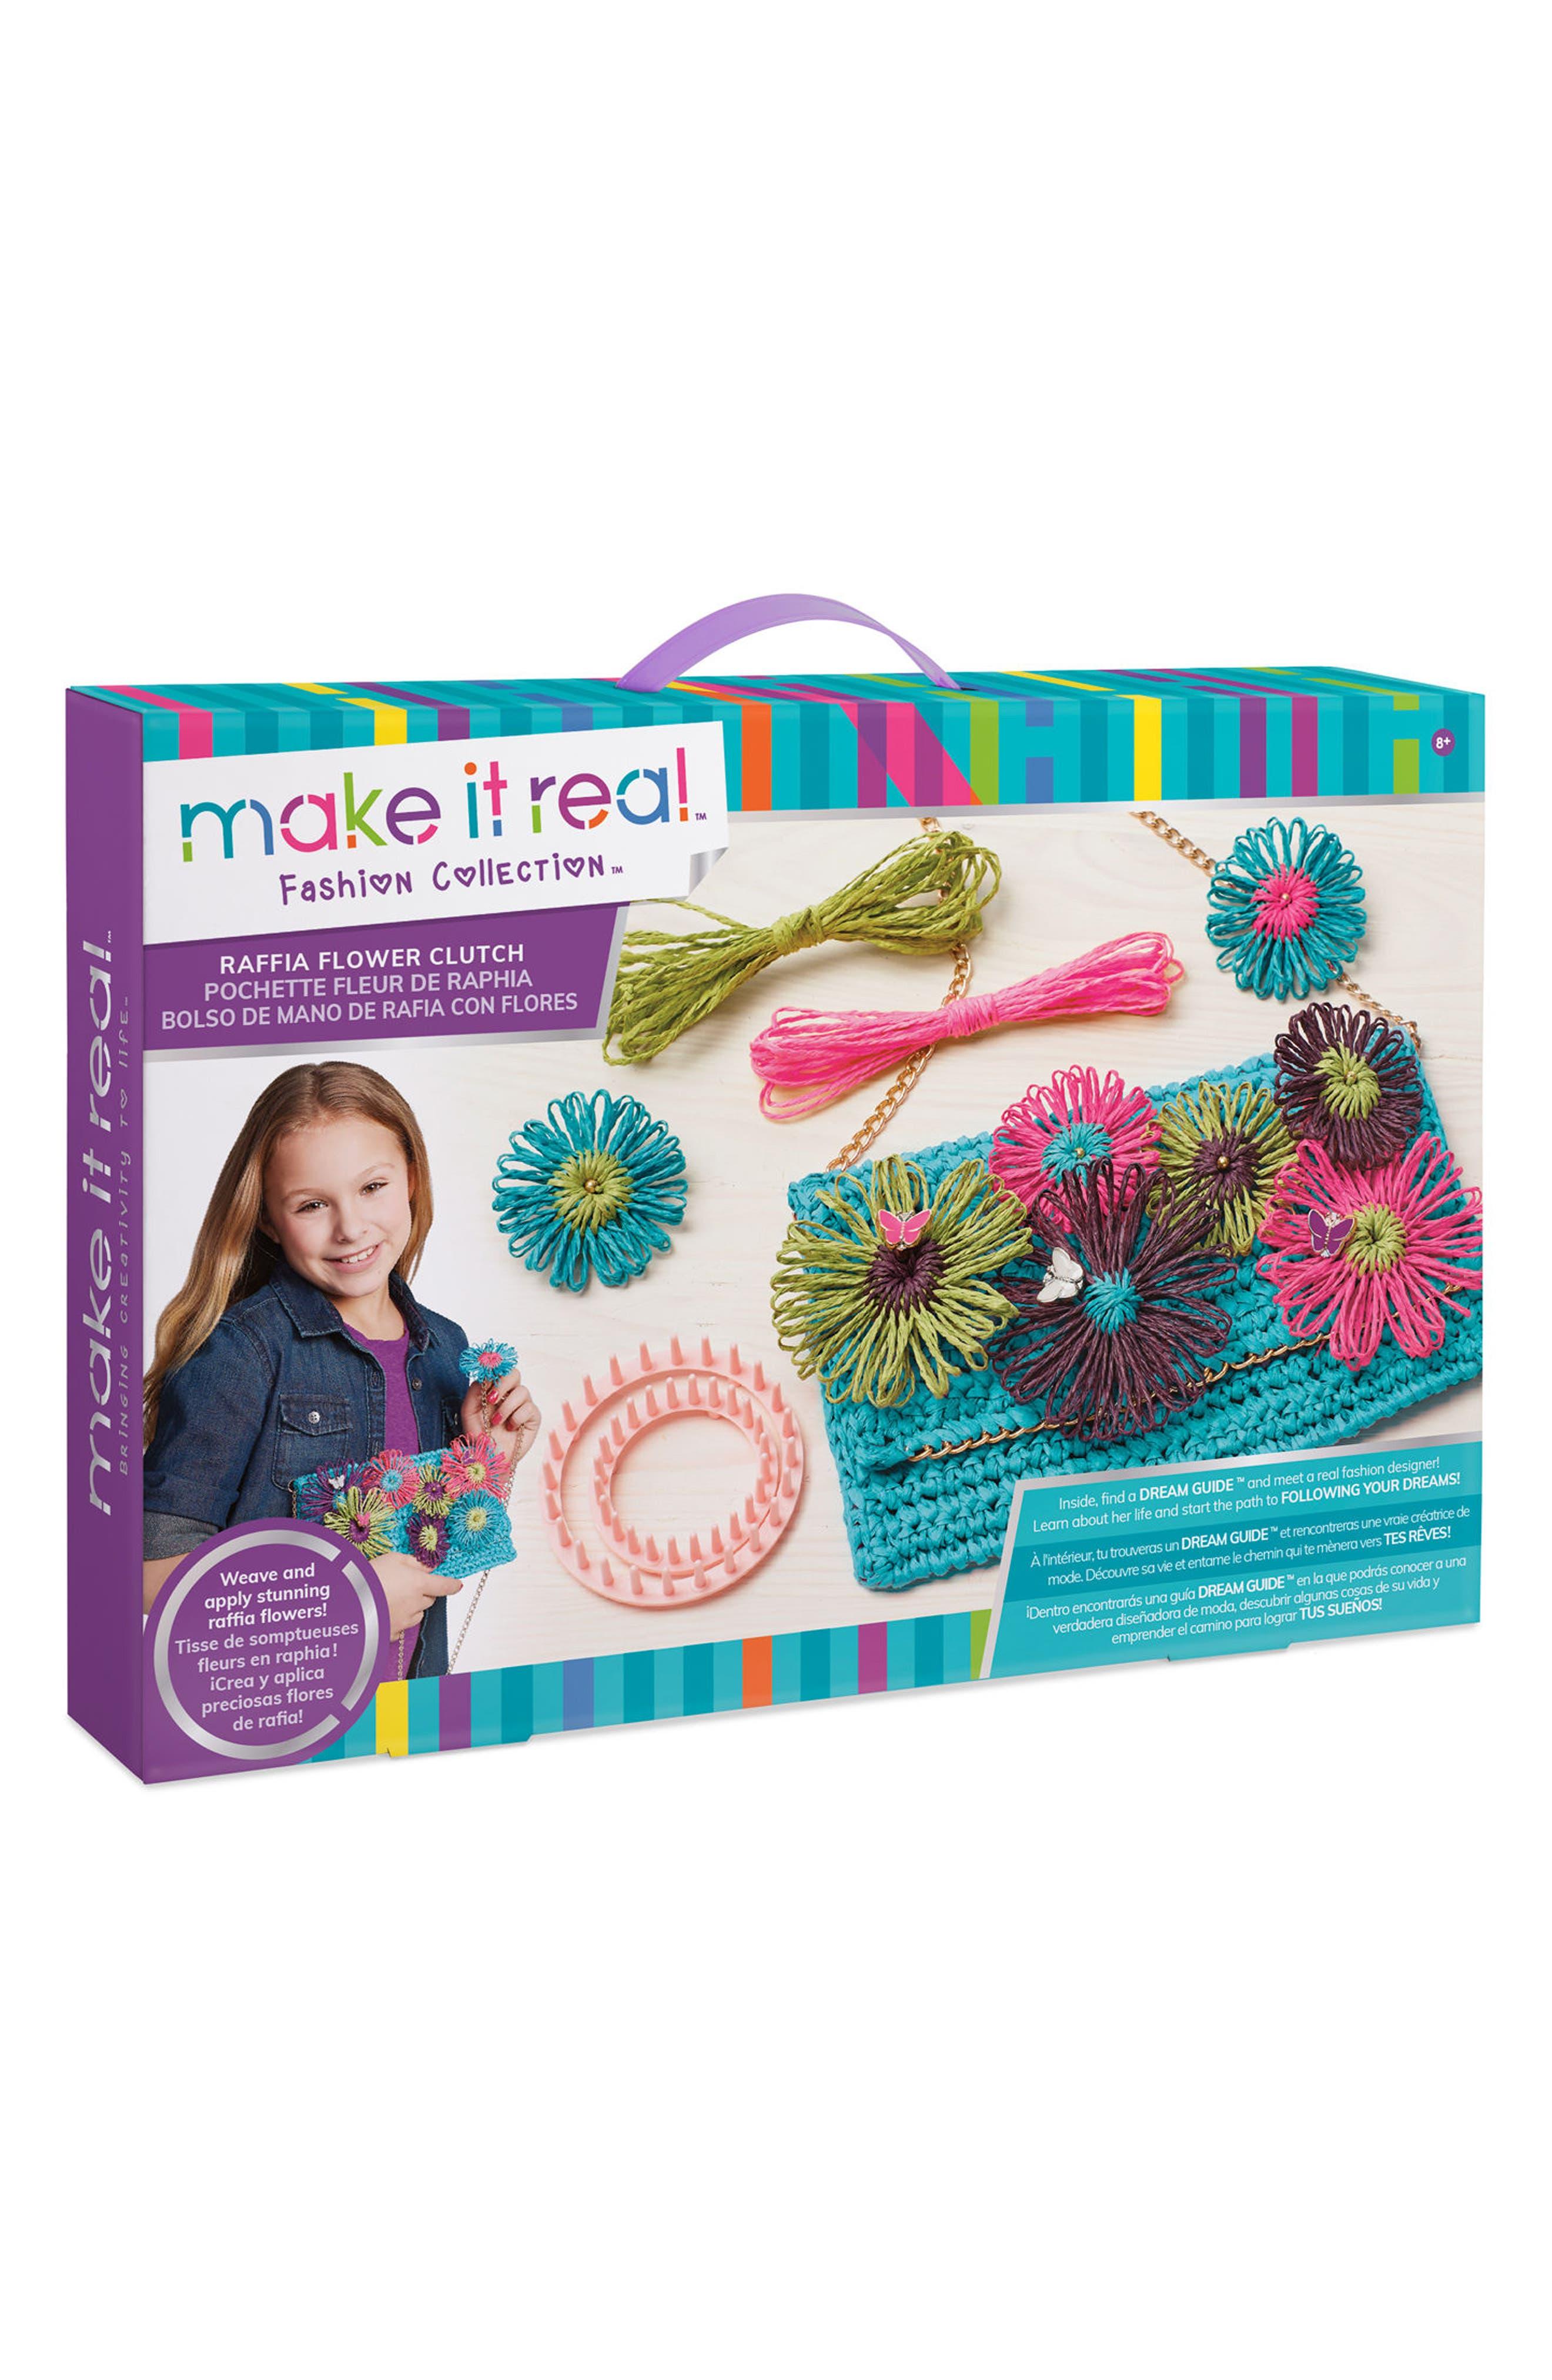 Make It Real Raffia Flower Clutch Kit